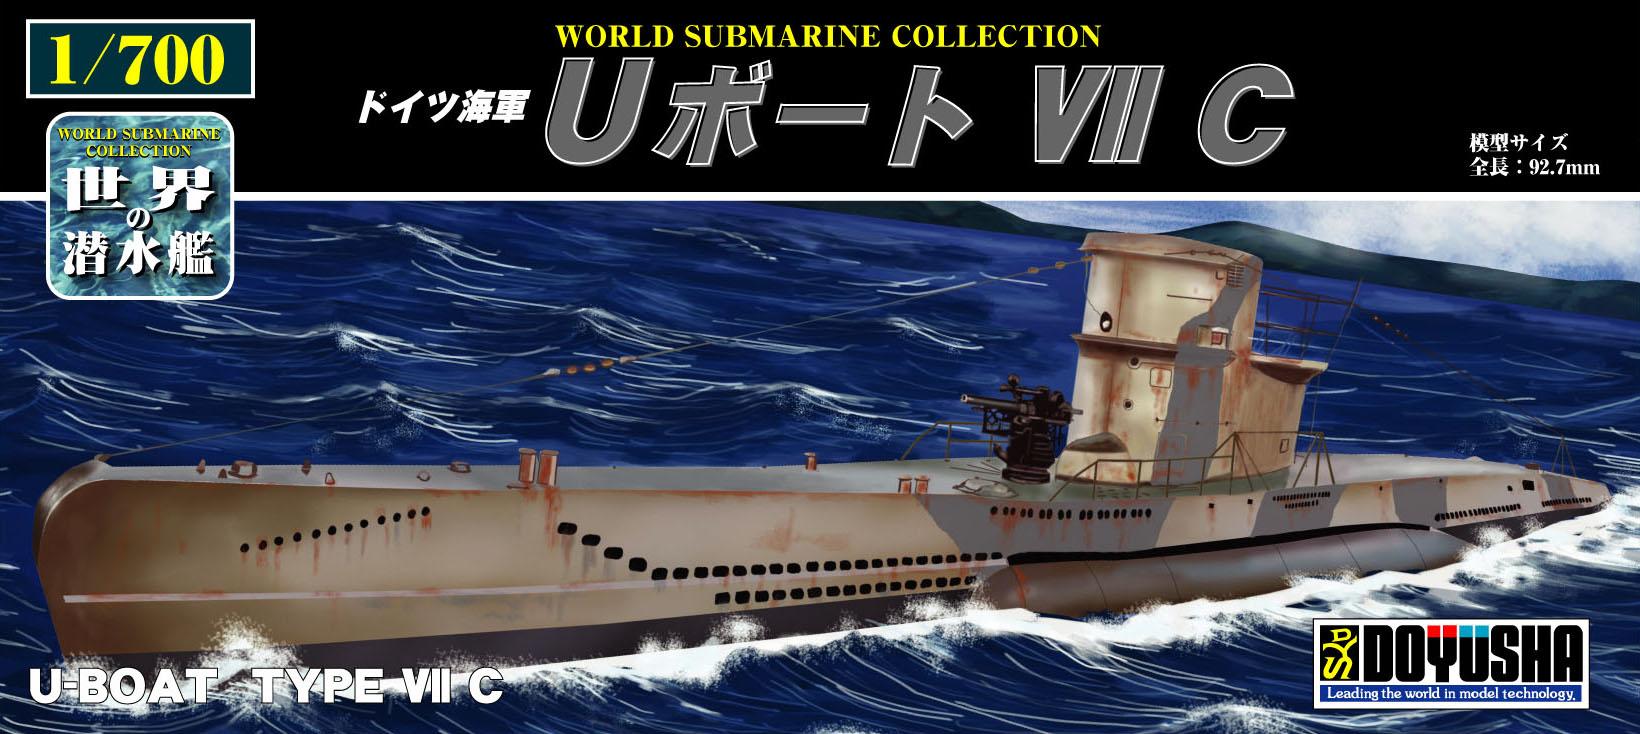 Doyusha DKM U-boat Type VII C